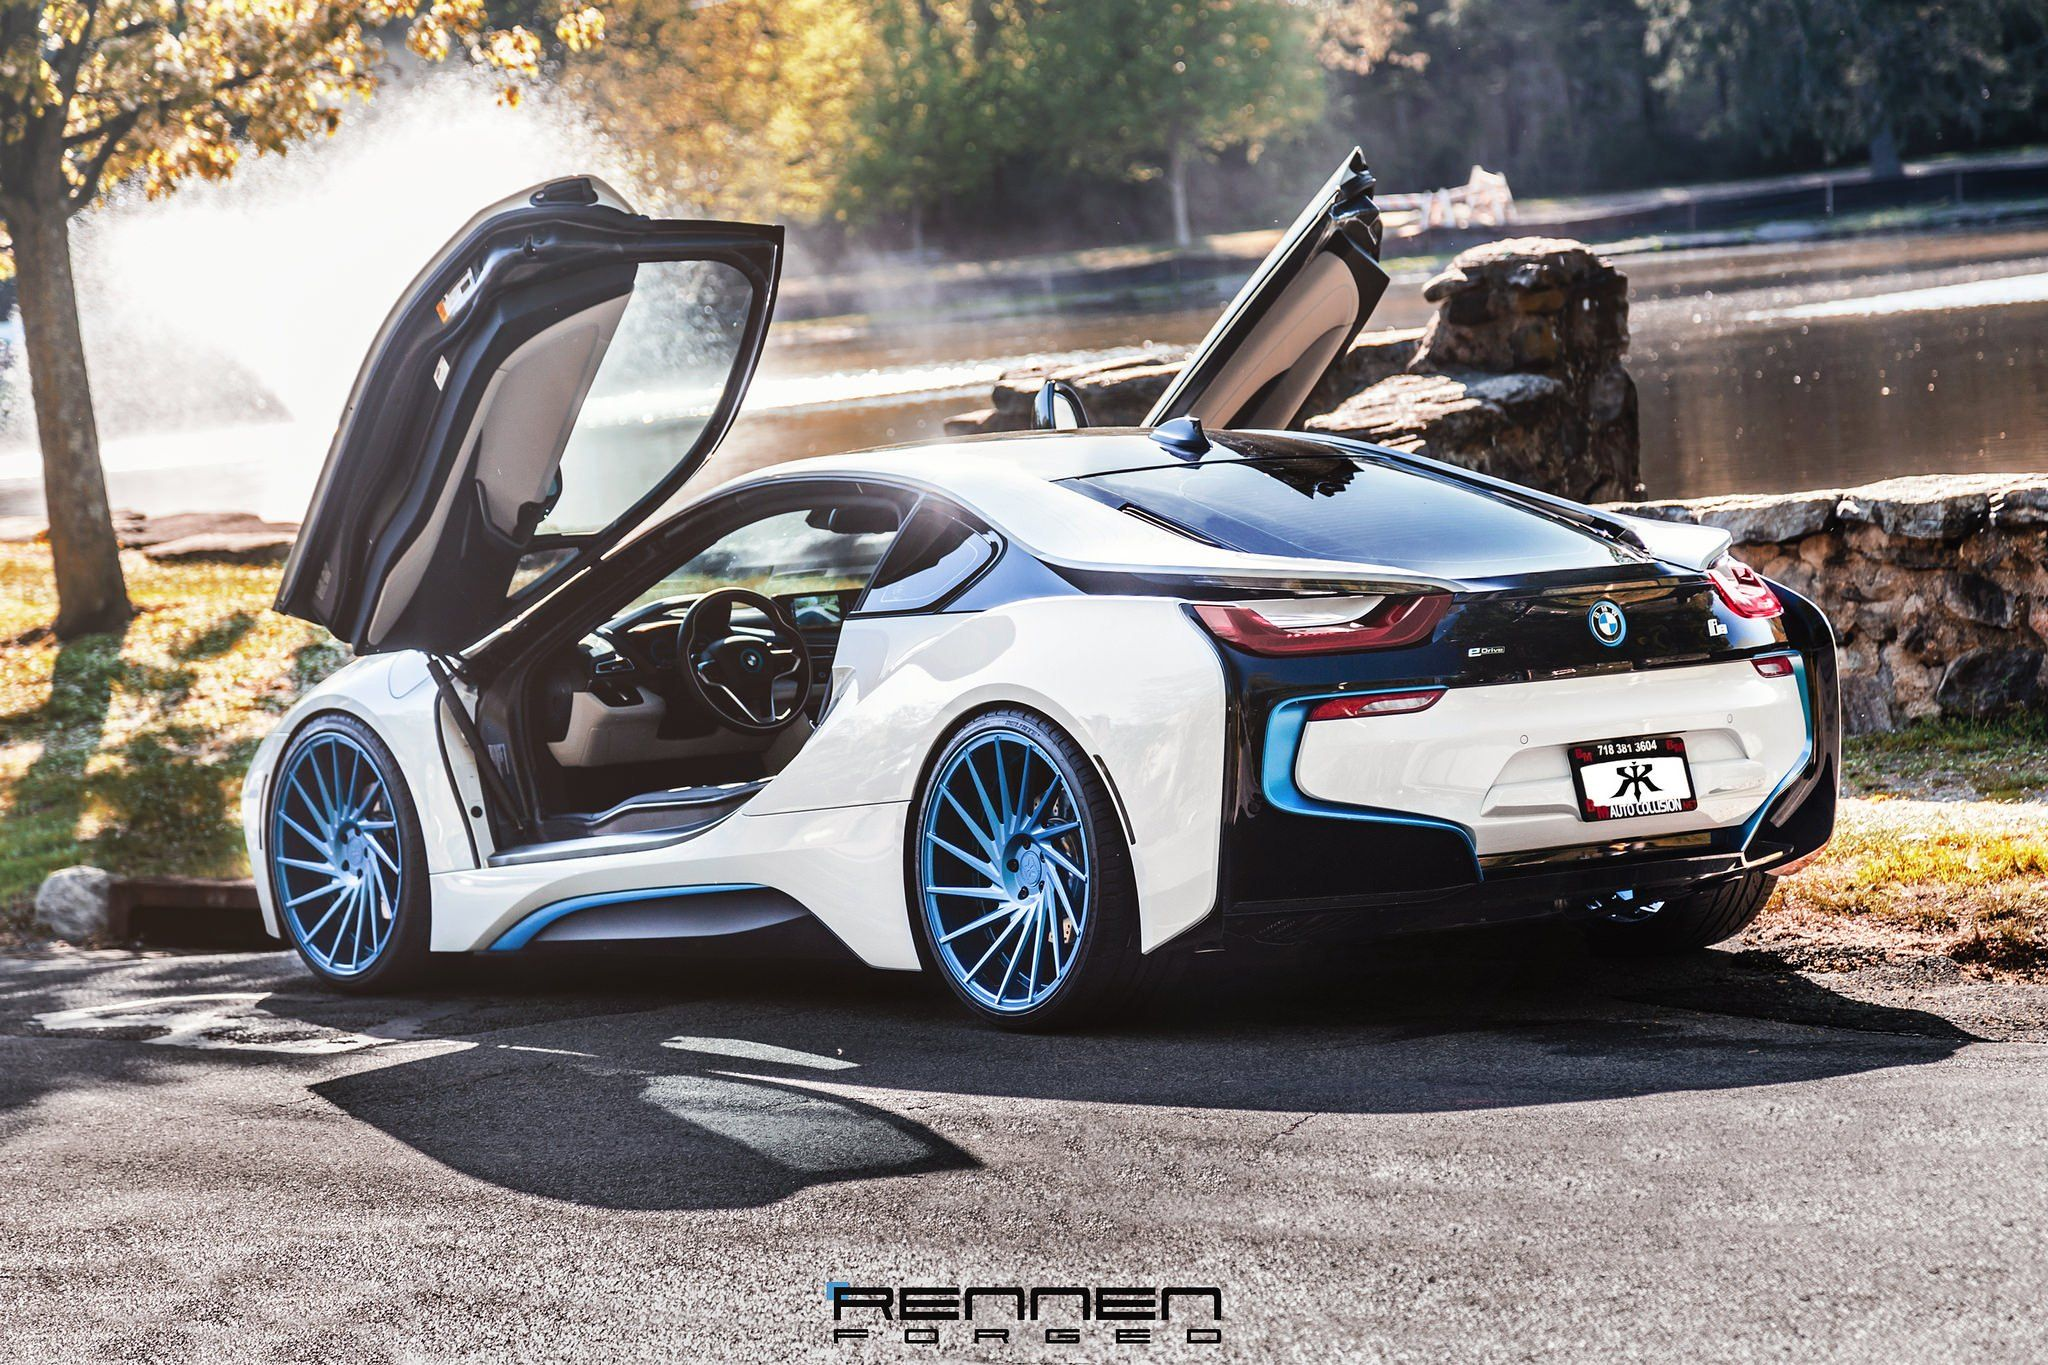 Revolutionary Machine White Bmw I8 On Blue Forged Rennen Wheels Bmw I8 Bmw Super Sport Cars